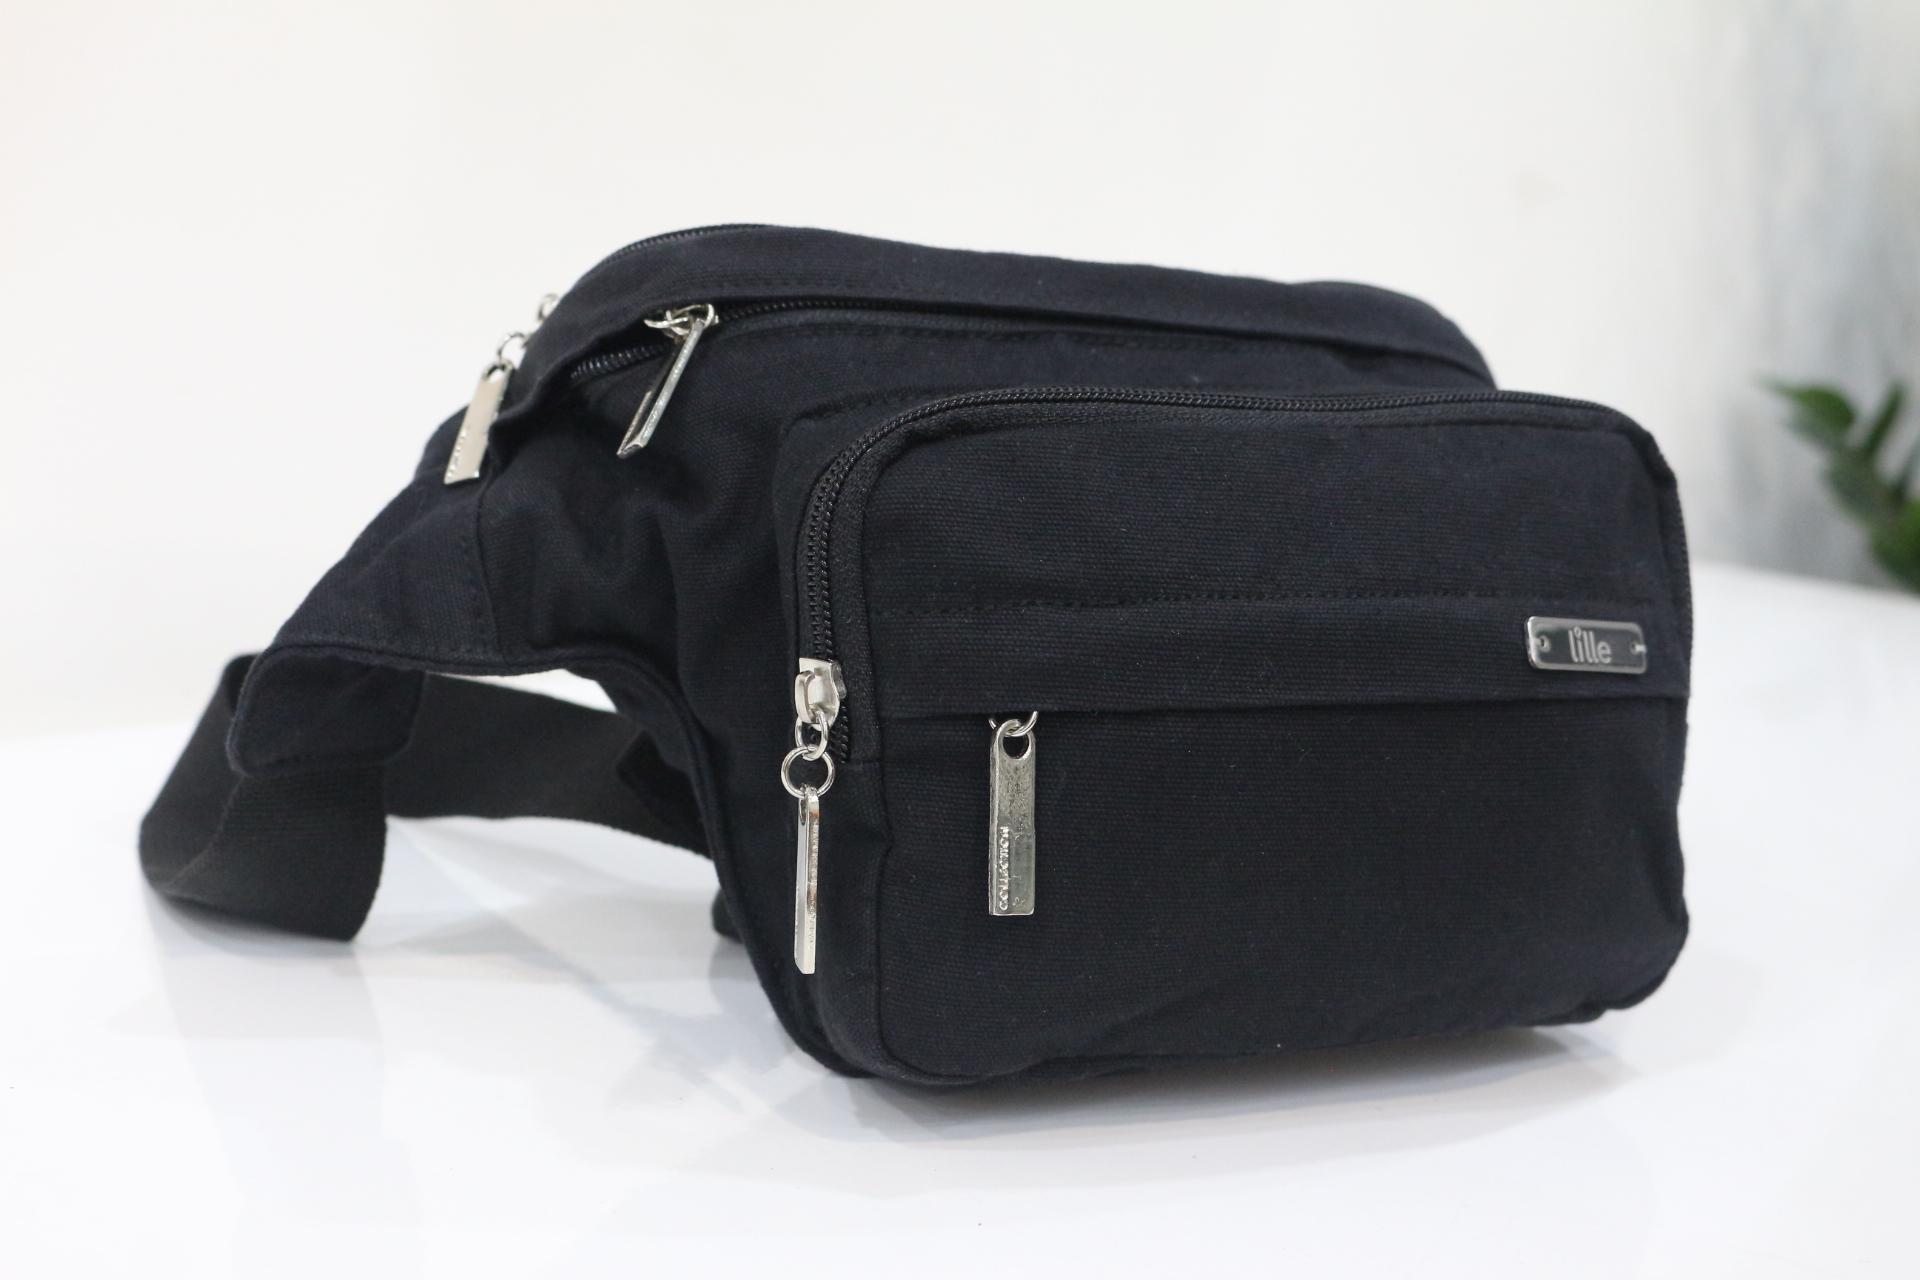 Túi bao tử BUM CANVAS BAG - màu đen